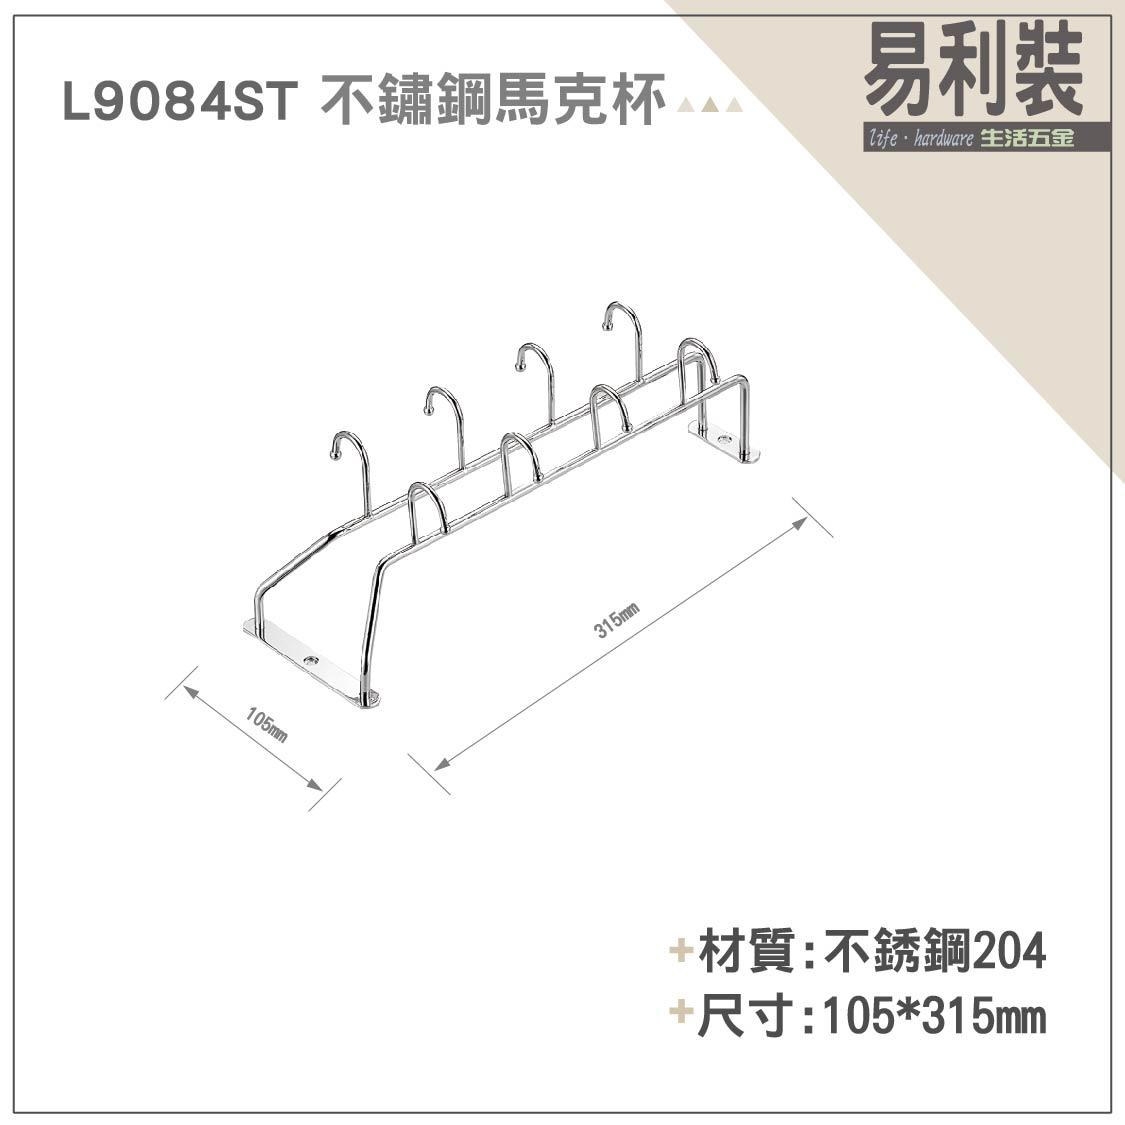 【 EASYCAN  】L9084 不鏽鋼馬克杯架 易利裝生活五金 餐廳 廚房 小資族 辦公家具 系統家具 1